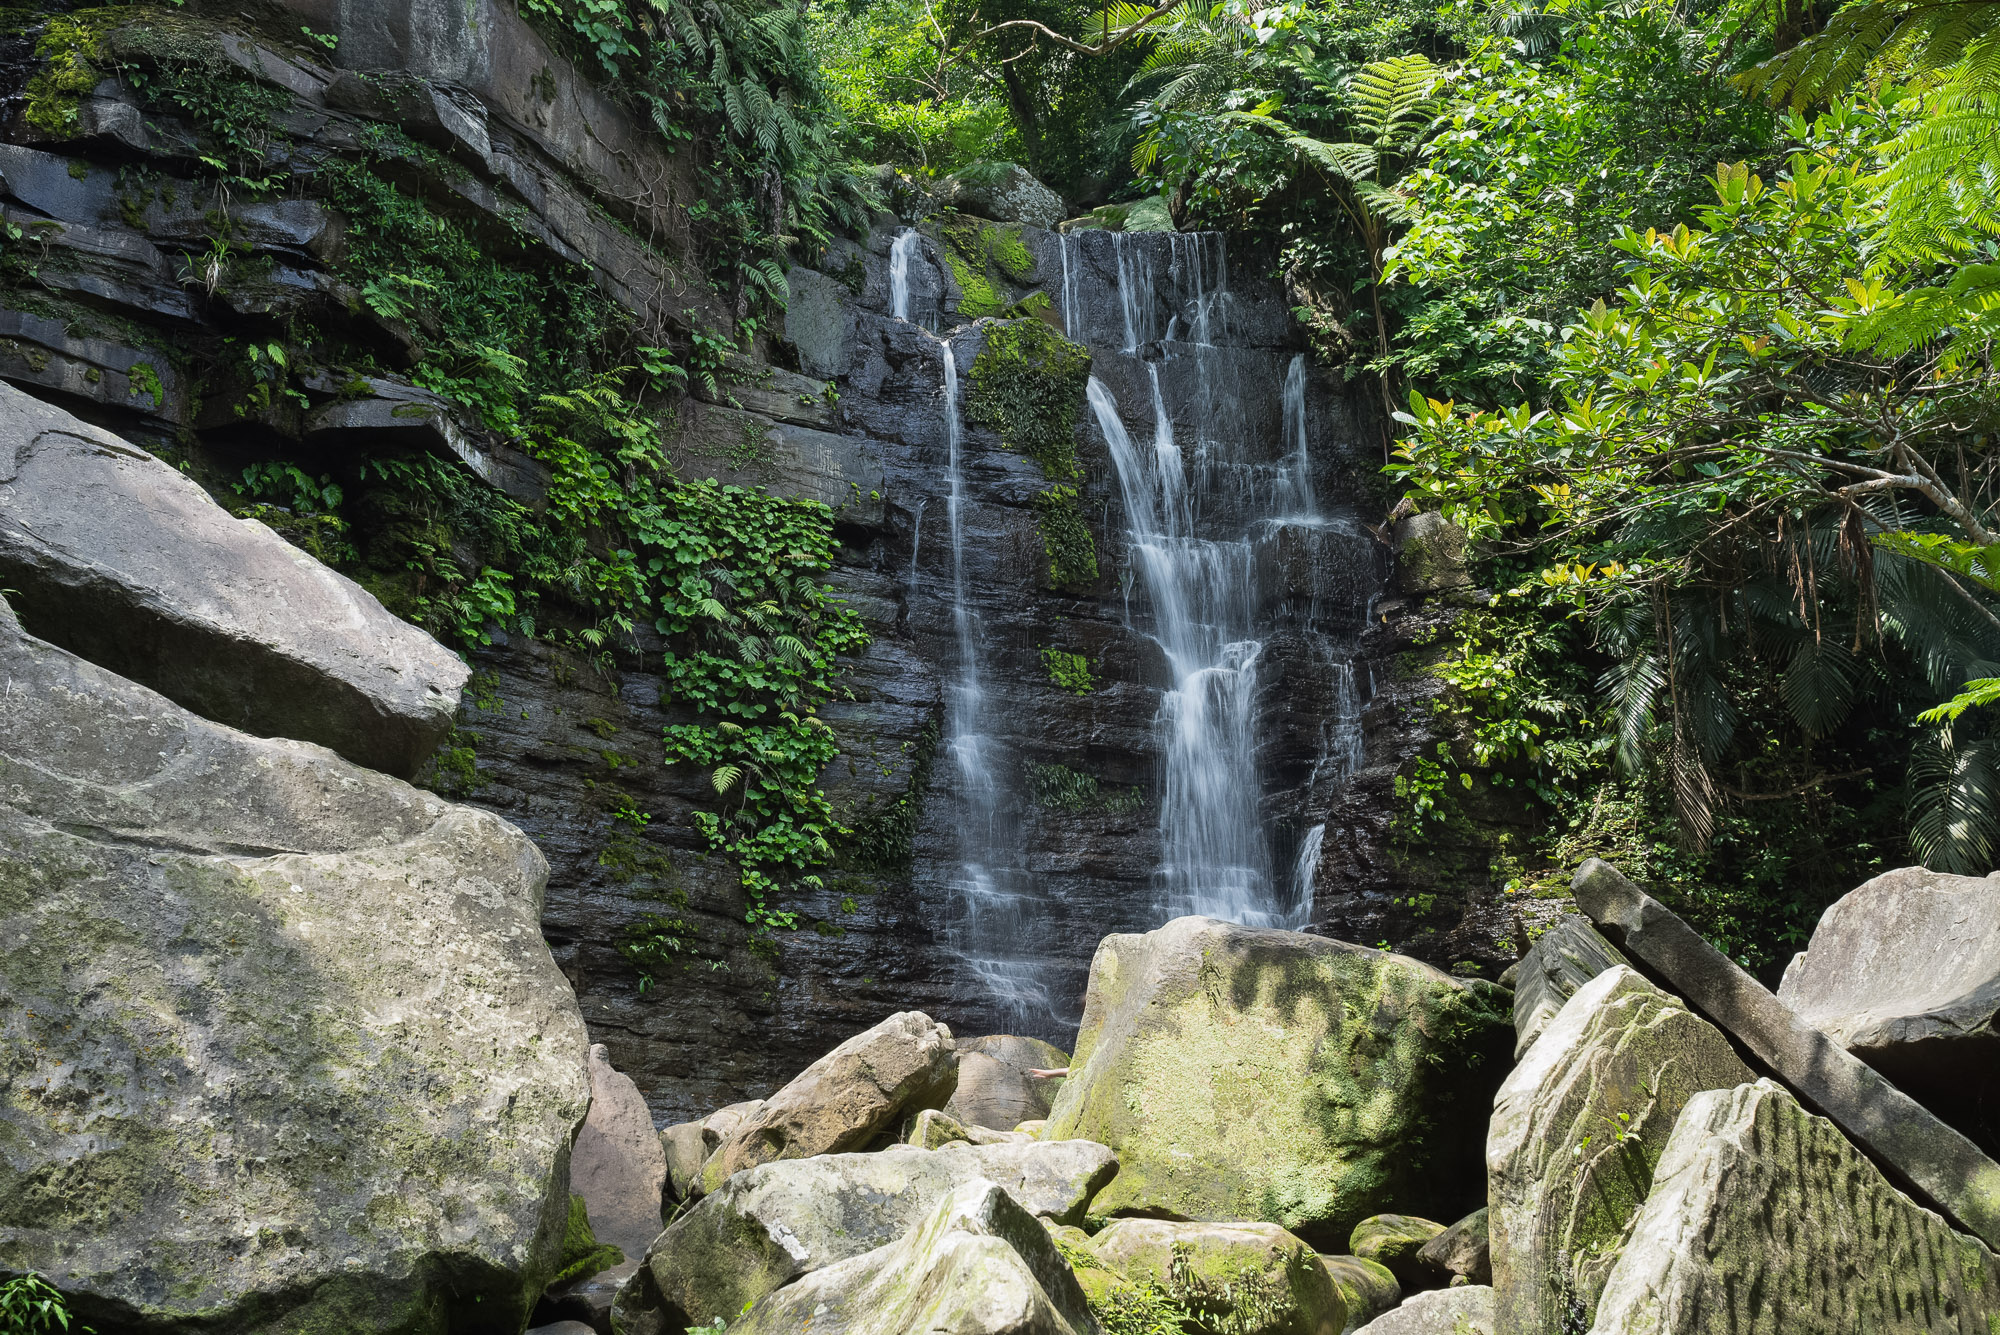 Stream Trekking to Geta Falls